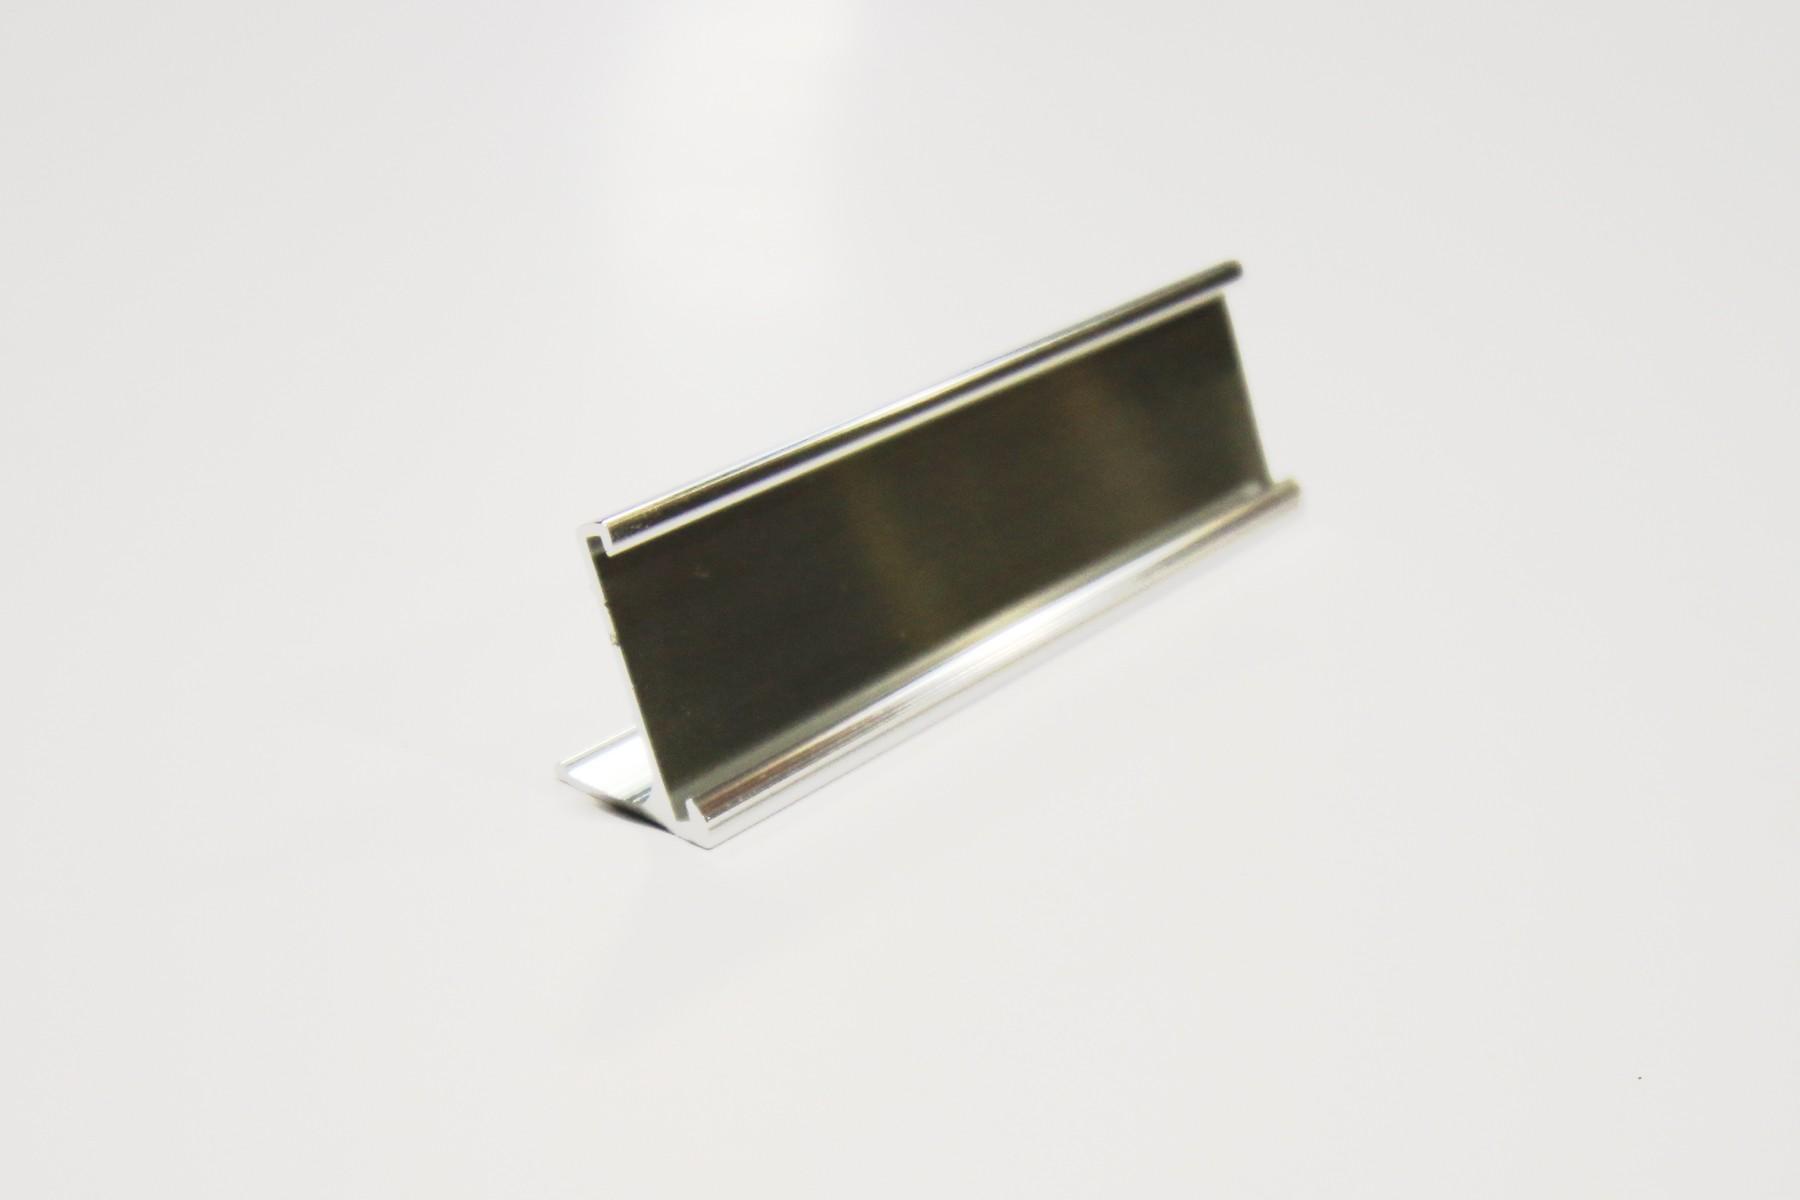 1 x 10 Desk Holder, Silver